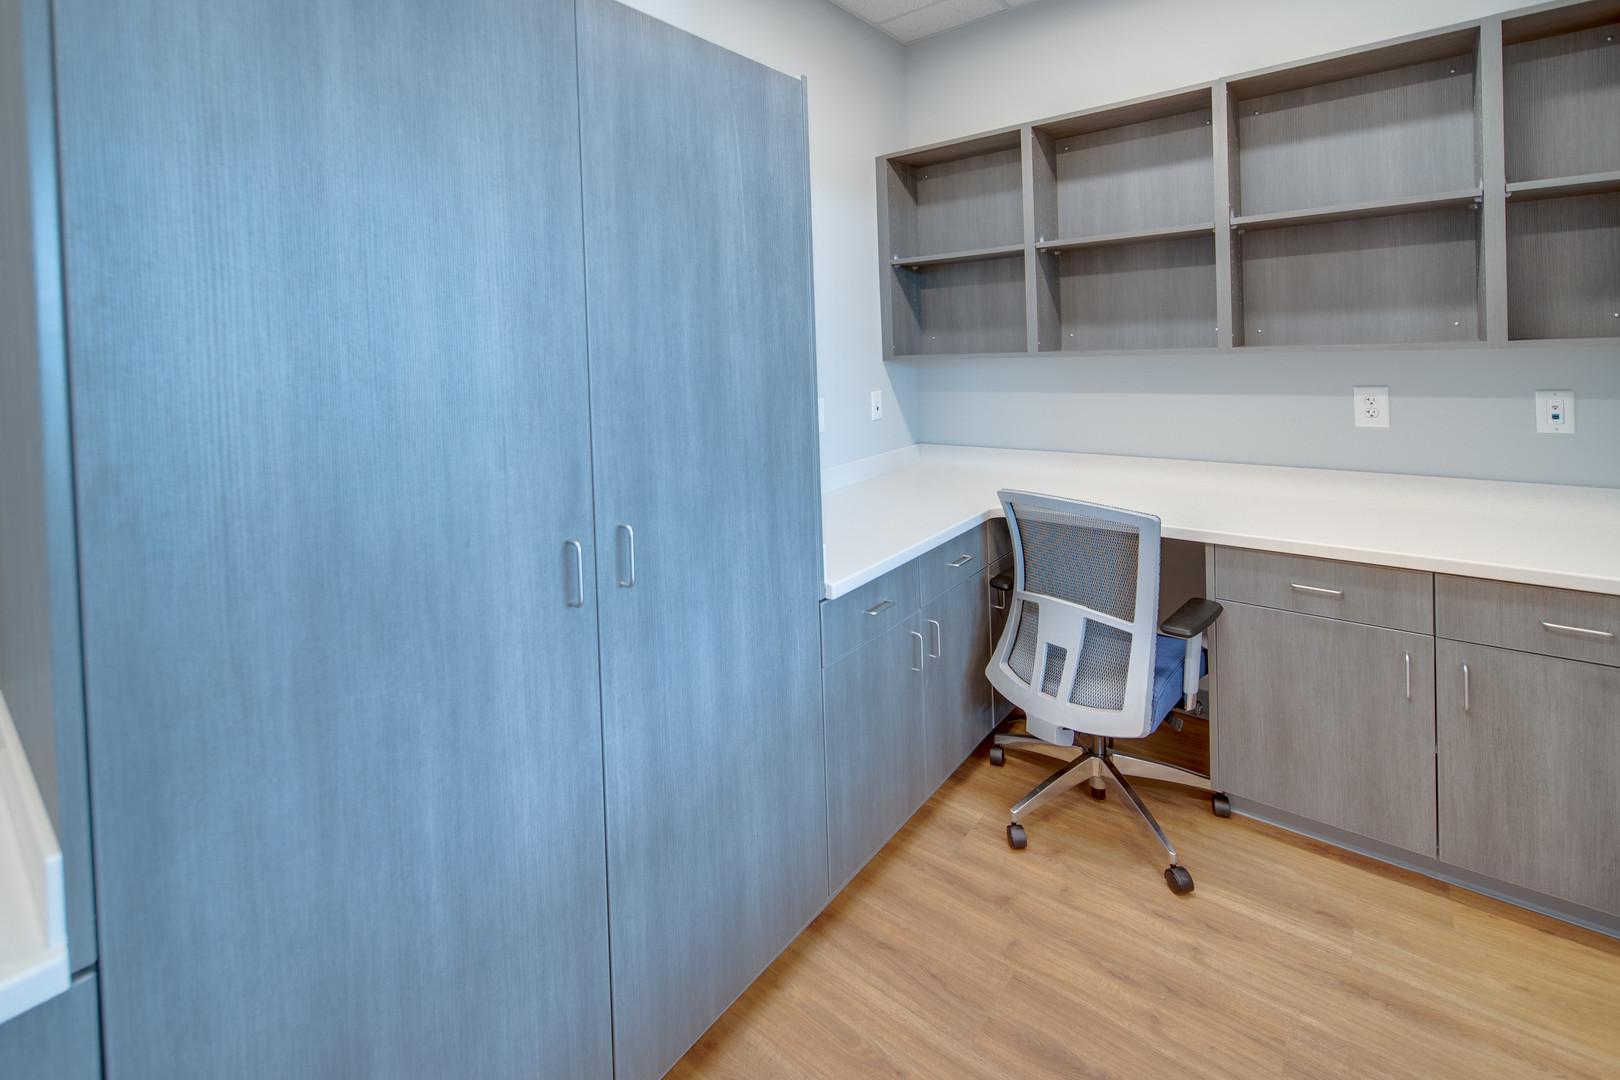 Bluewater Medical 08.28-40.jpg